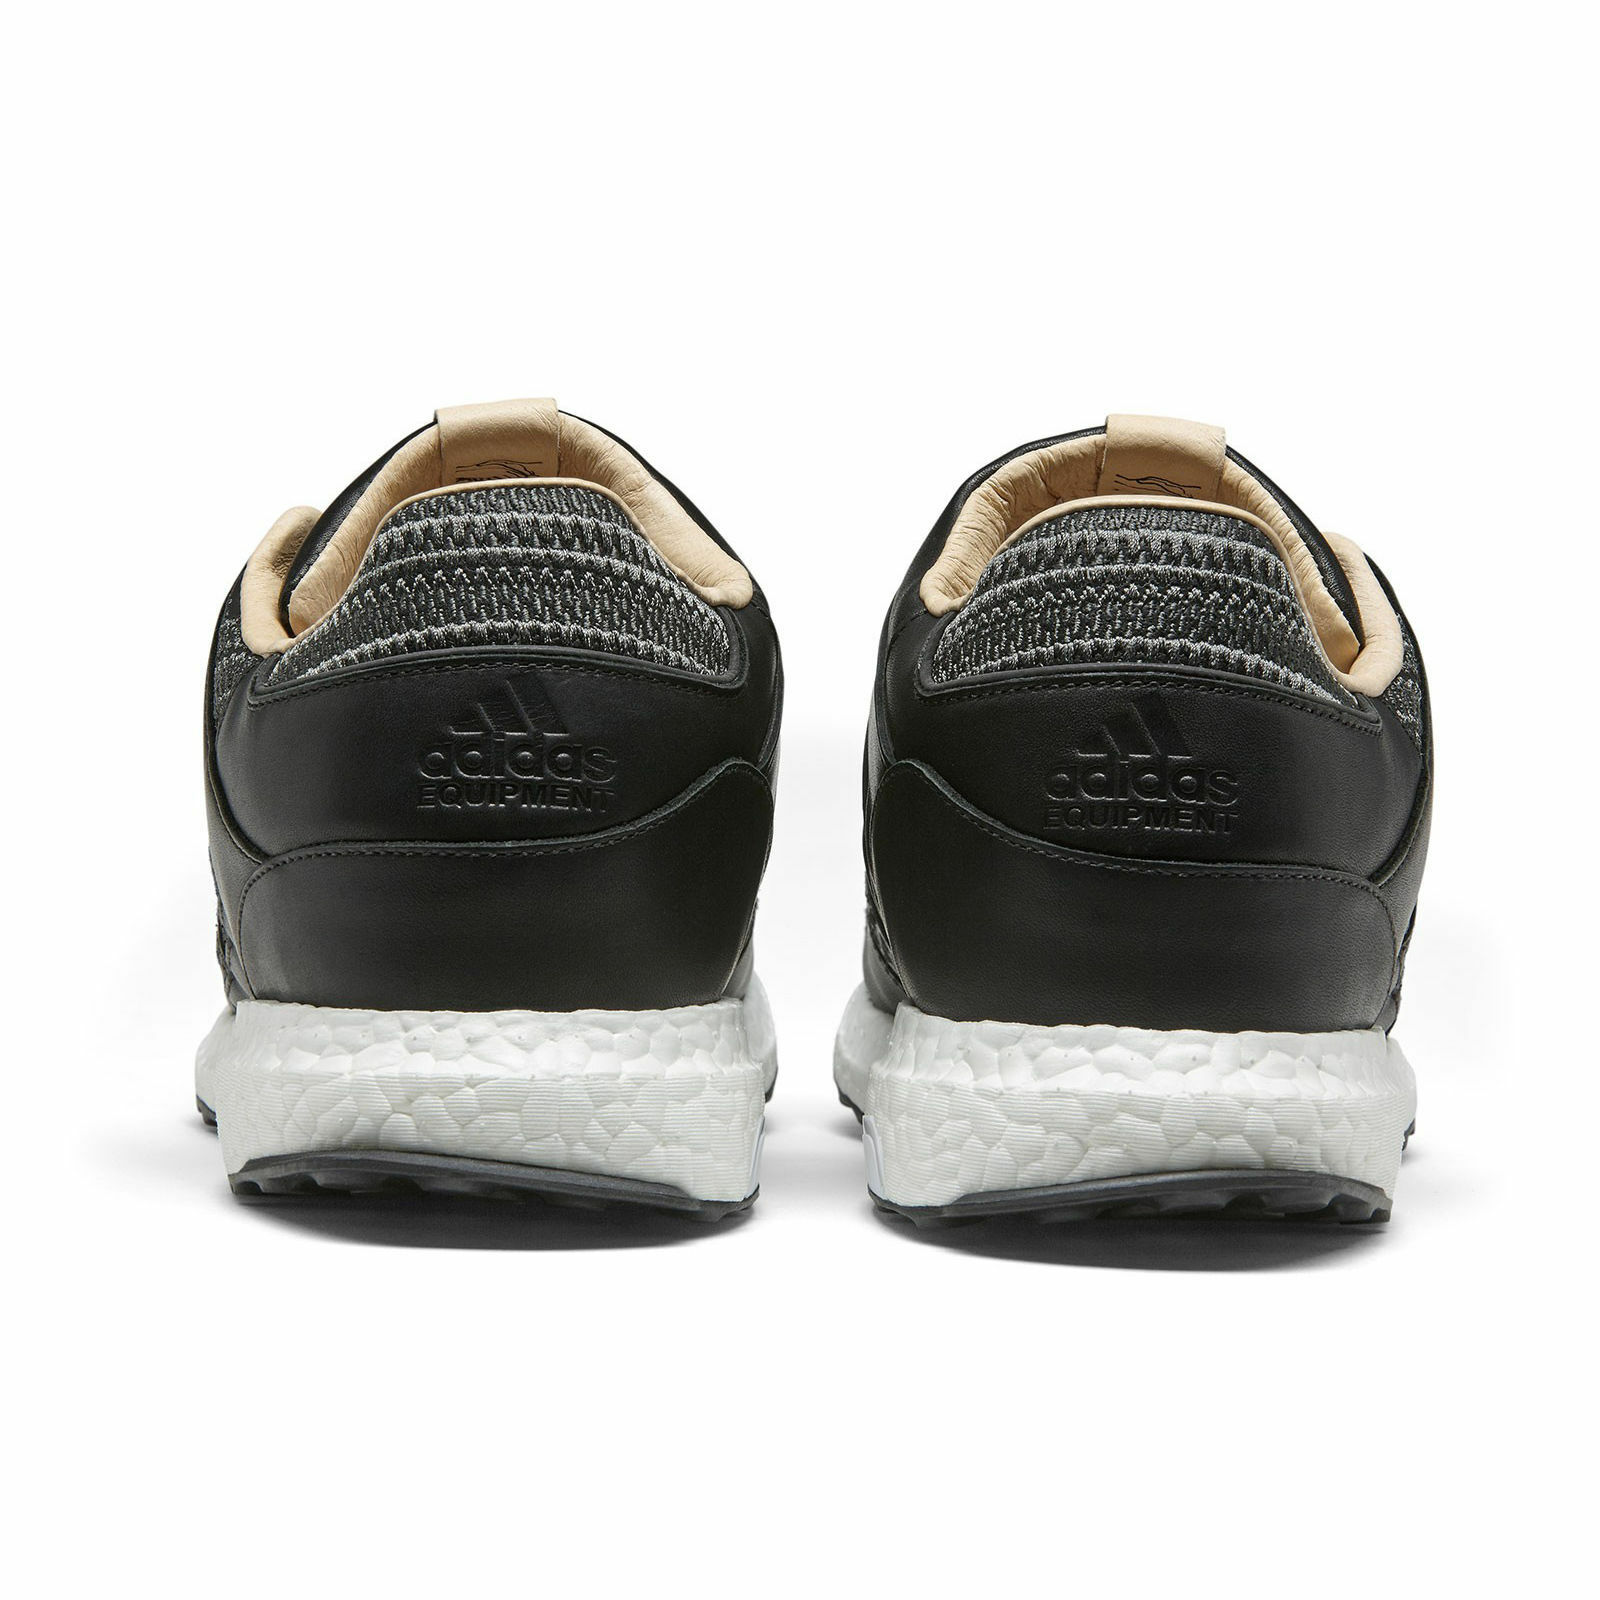 Adidas  Para Hombre Equipment CP9639 EQT Soporte 93/16 AV BOOST CP9639 Equipment UK6.5 NMD Alph af3457